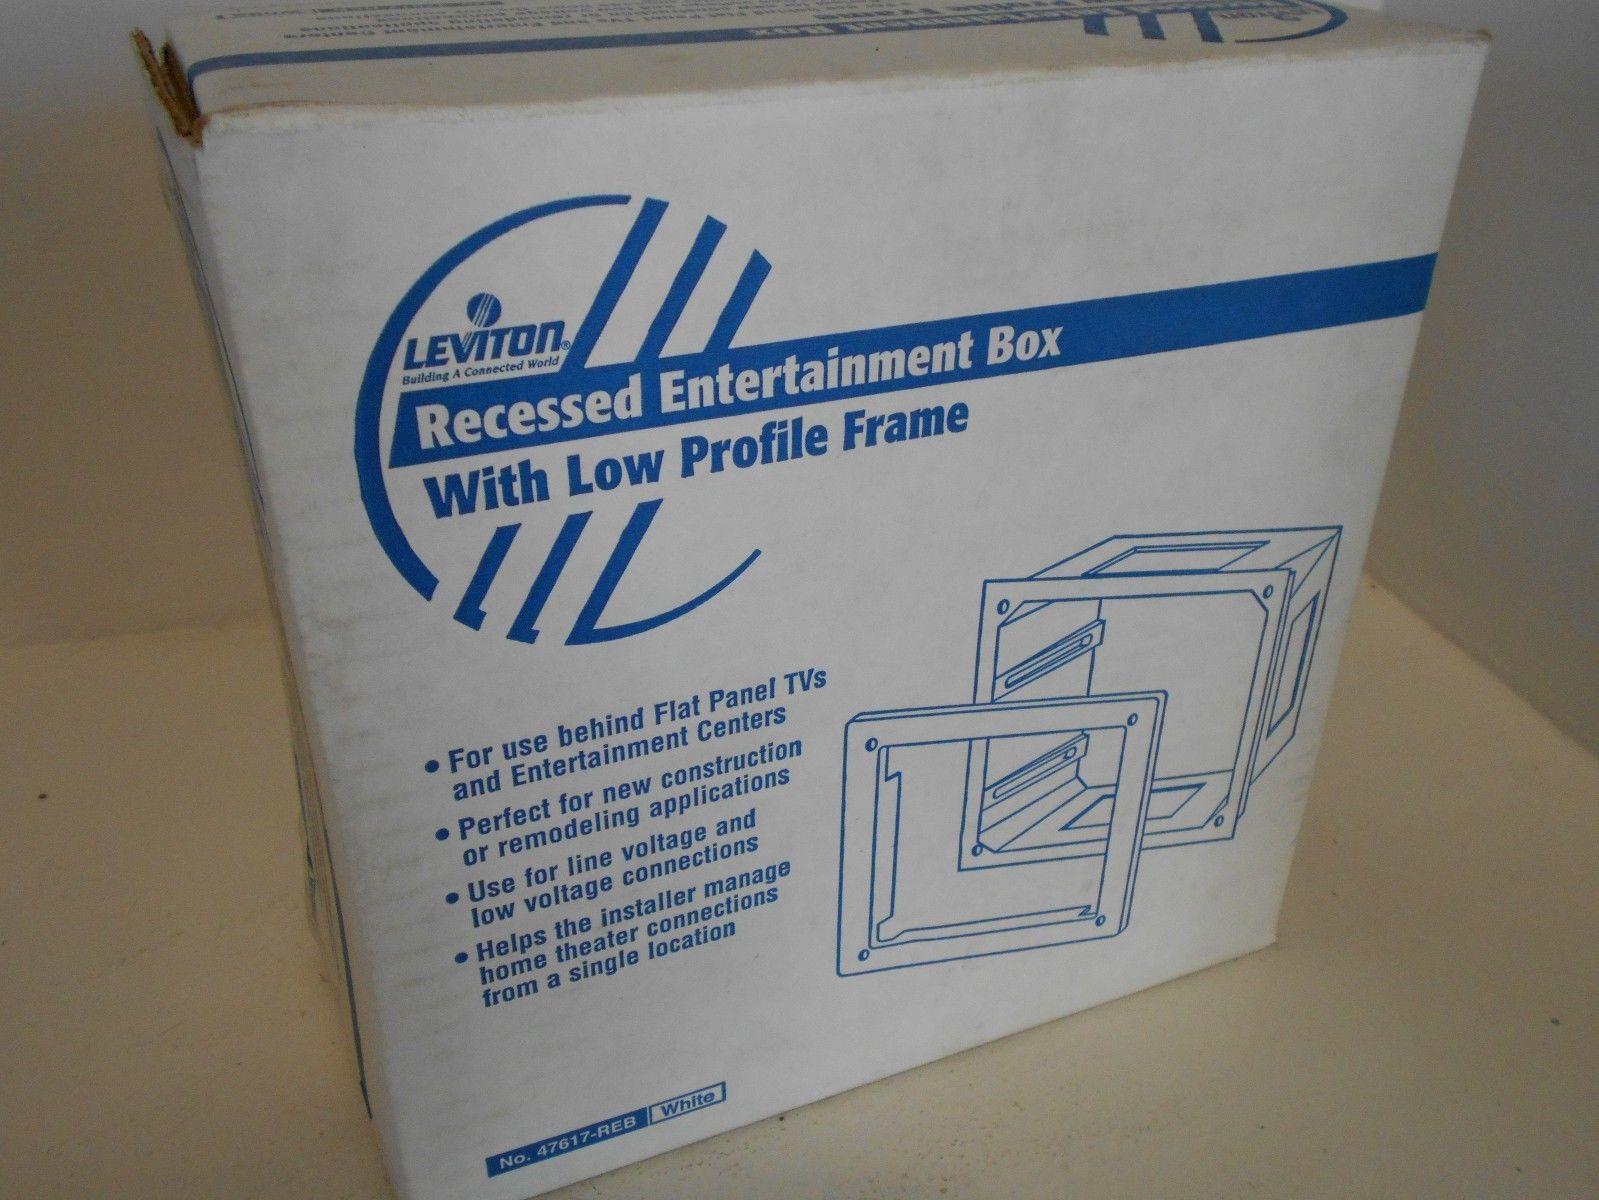 NIB LEVITON 47617-REB RECESSED ENTERTAINMENT BOX LOW PROFILE FRAME ...